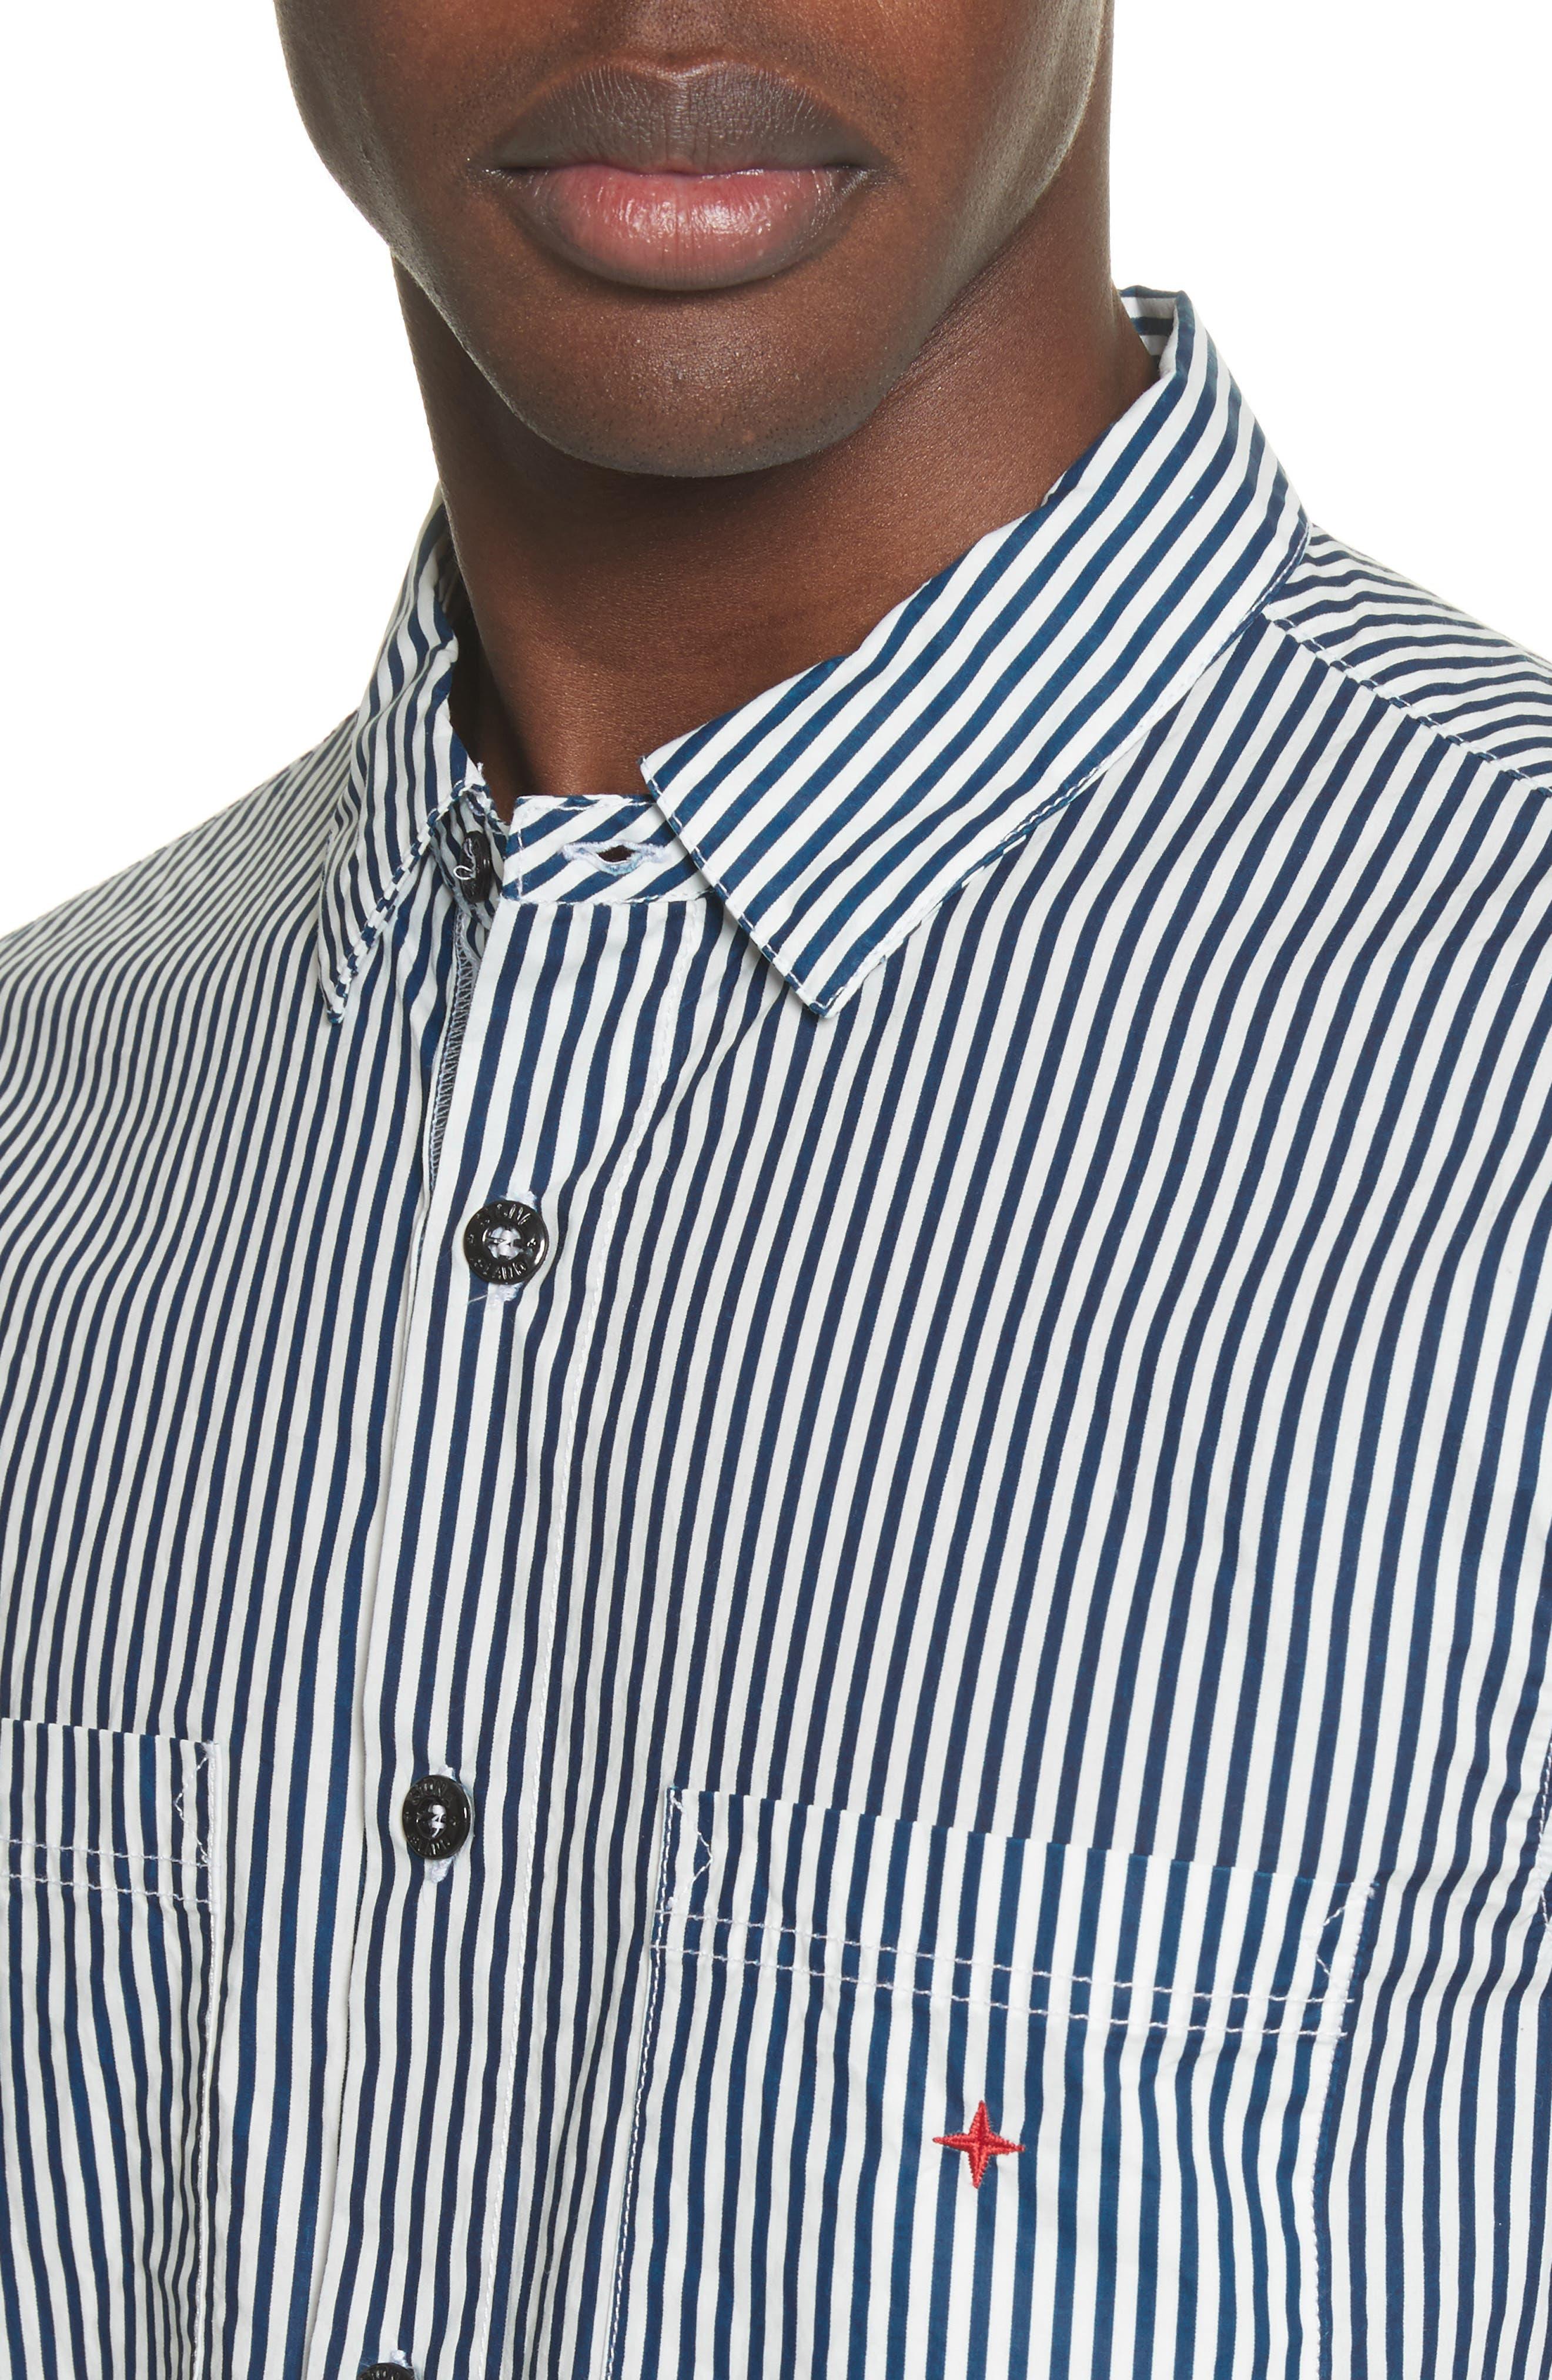 Stripe Woven Shirt,                             Alternate thumbnail 4, color,                             White